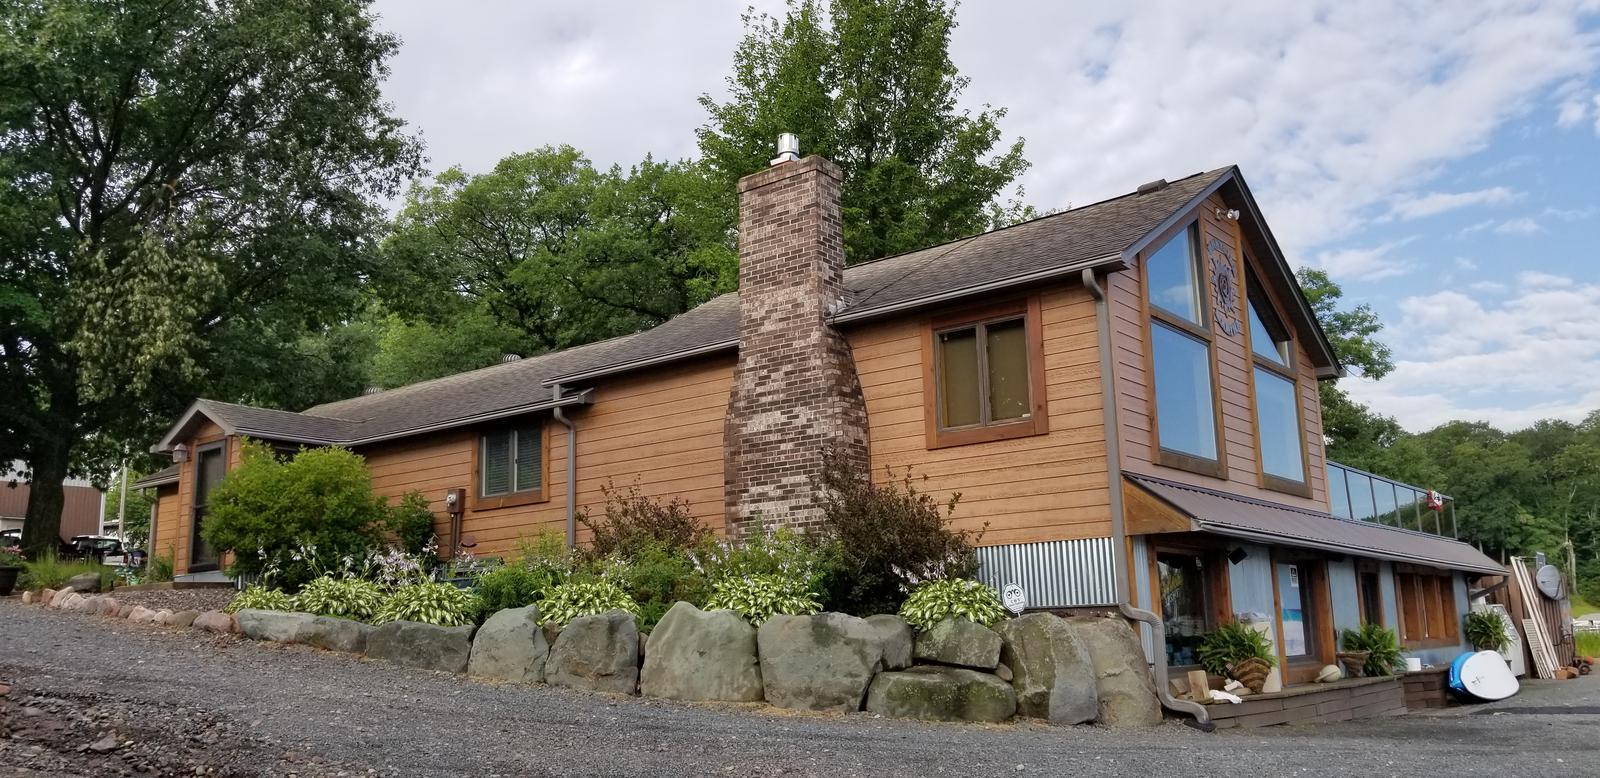 Cabin Rentals Sunnyside Marina Balsam Lake, WI (888)422-5726